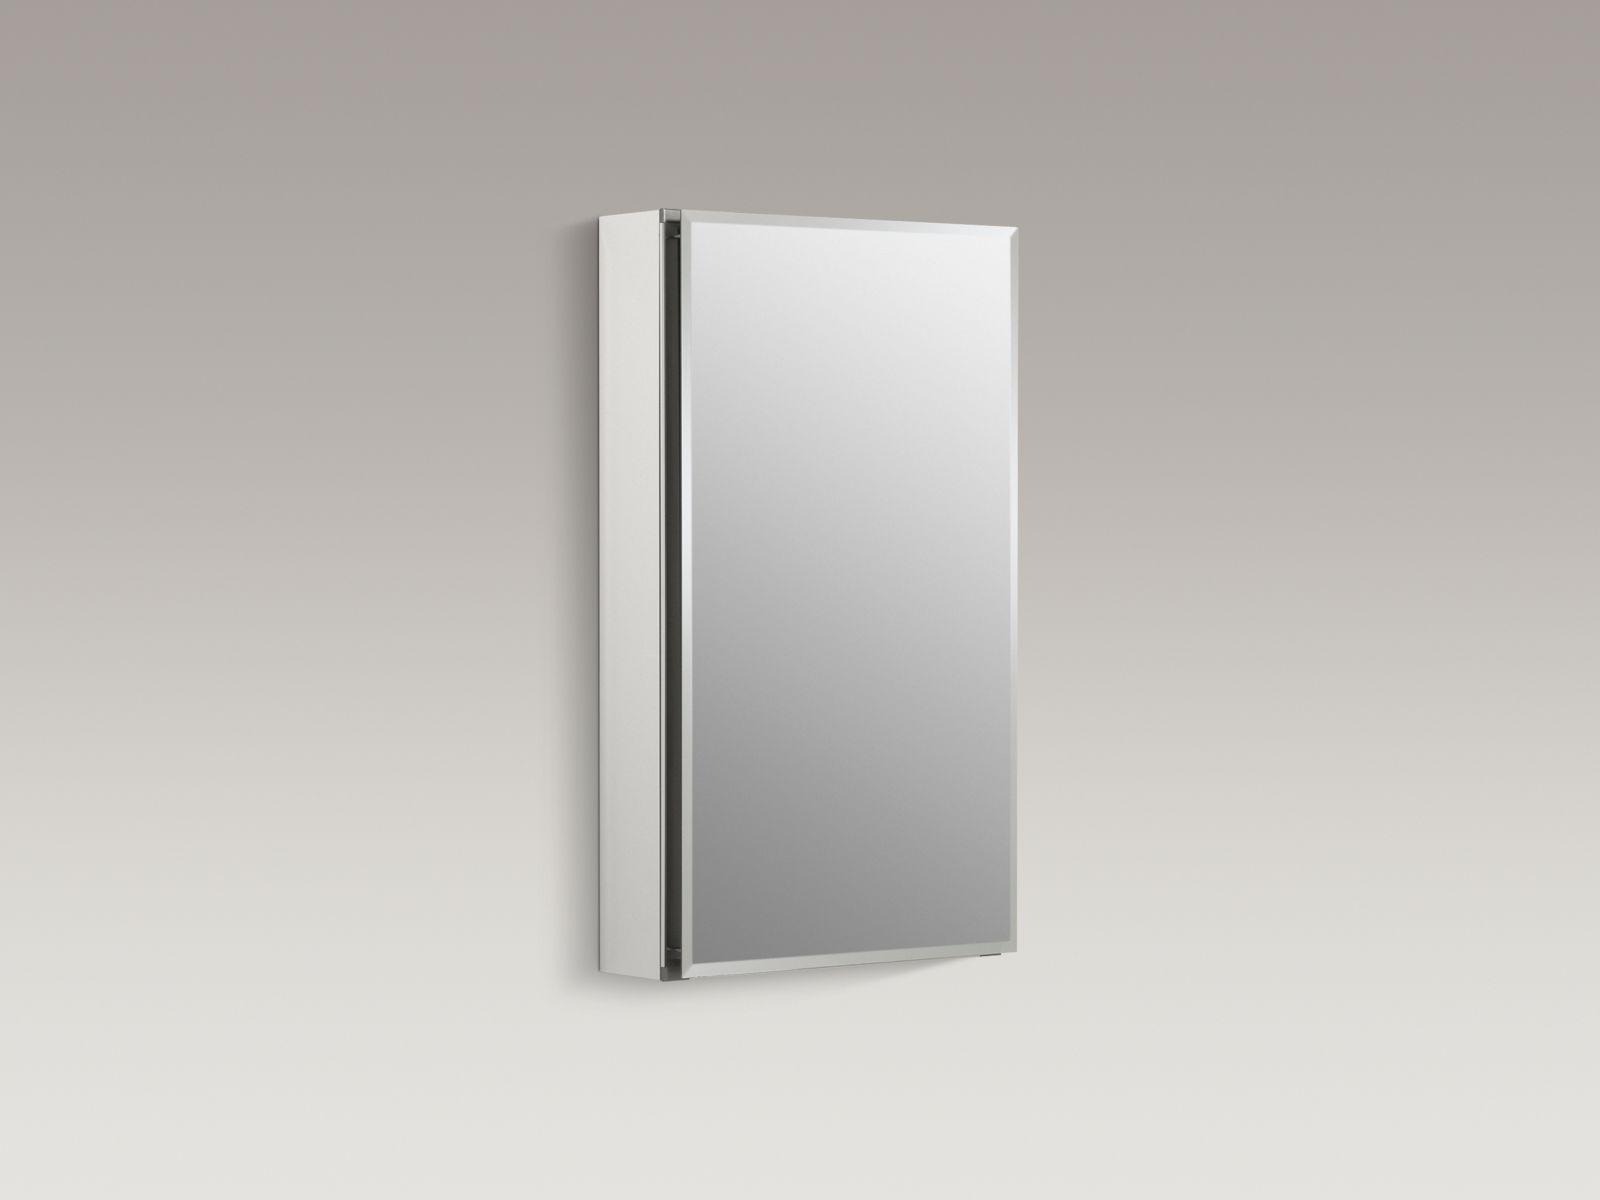 "Kohler K-CB-CLC1526FS Aluminum 15"" x 26"" Single-door Medicine Cabinet with Square Mirrored Door"